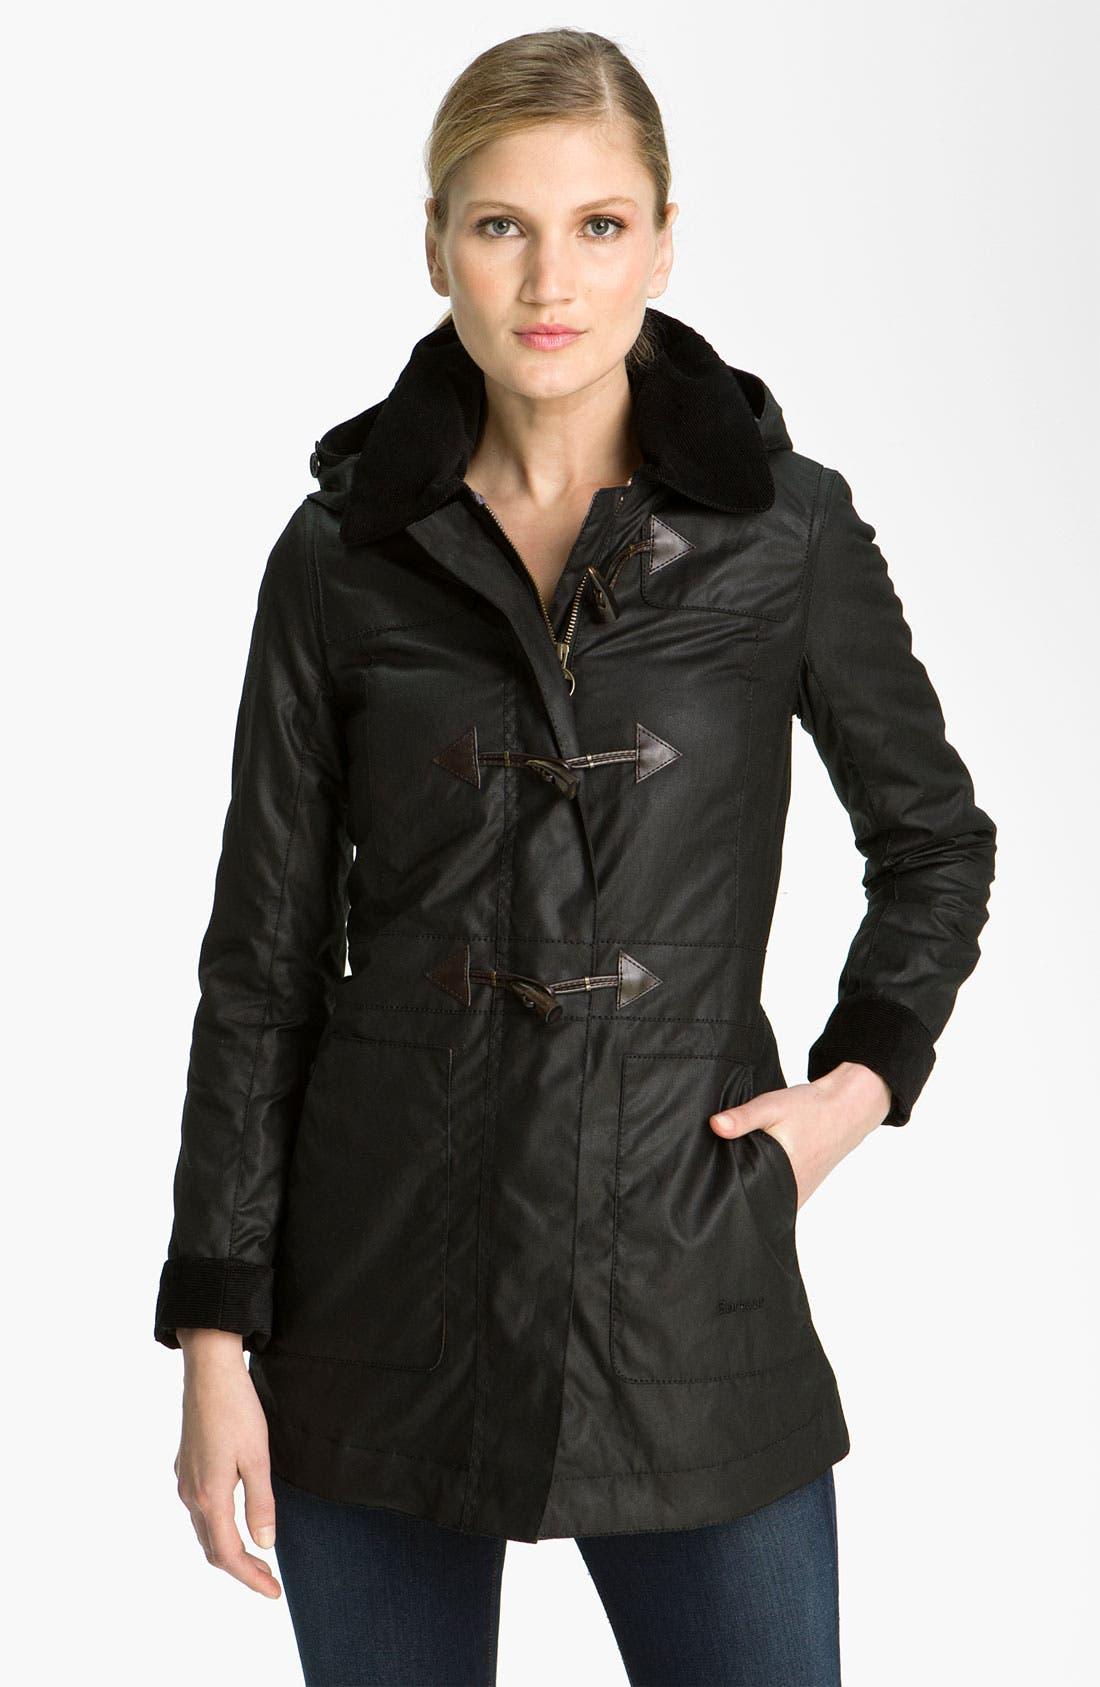 Alternate Image 1 Selected - Barbour 'Buttermere' Waterproof Duffle Coat (Online Exclusive)